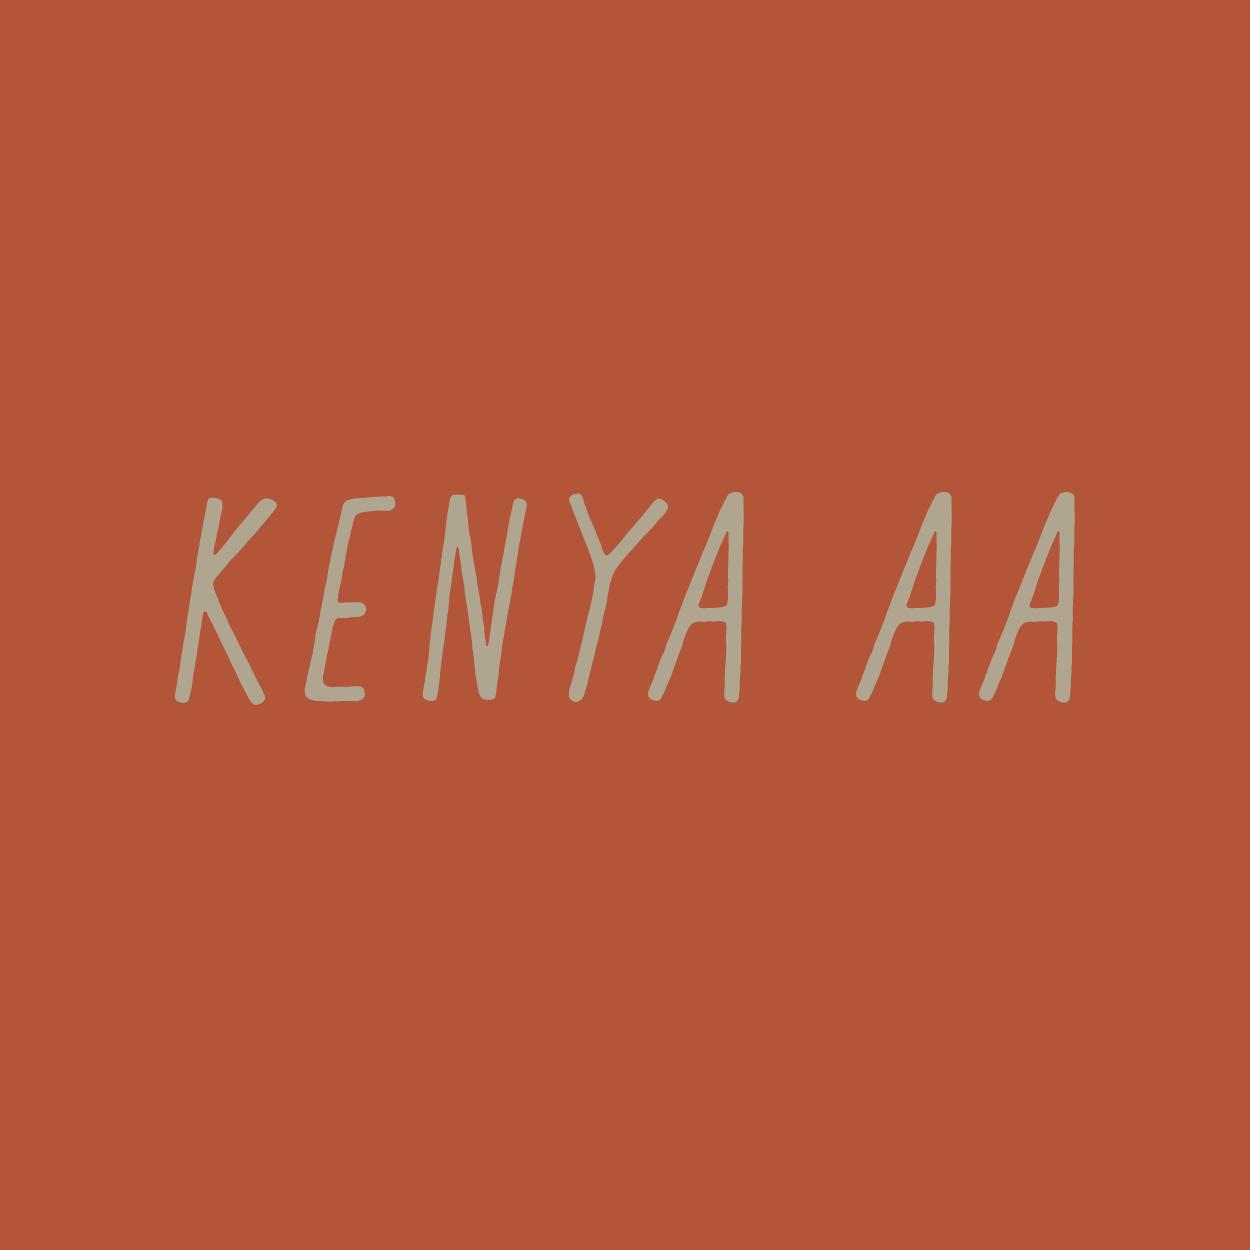 kenya_office.png